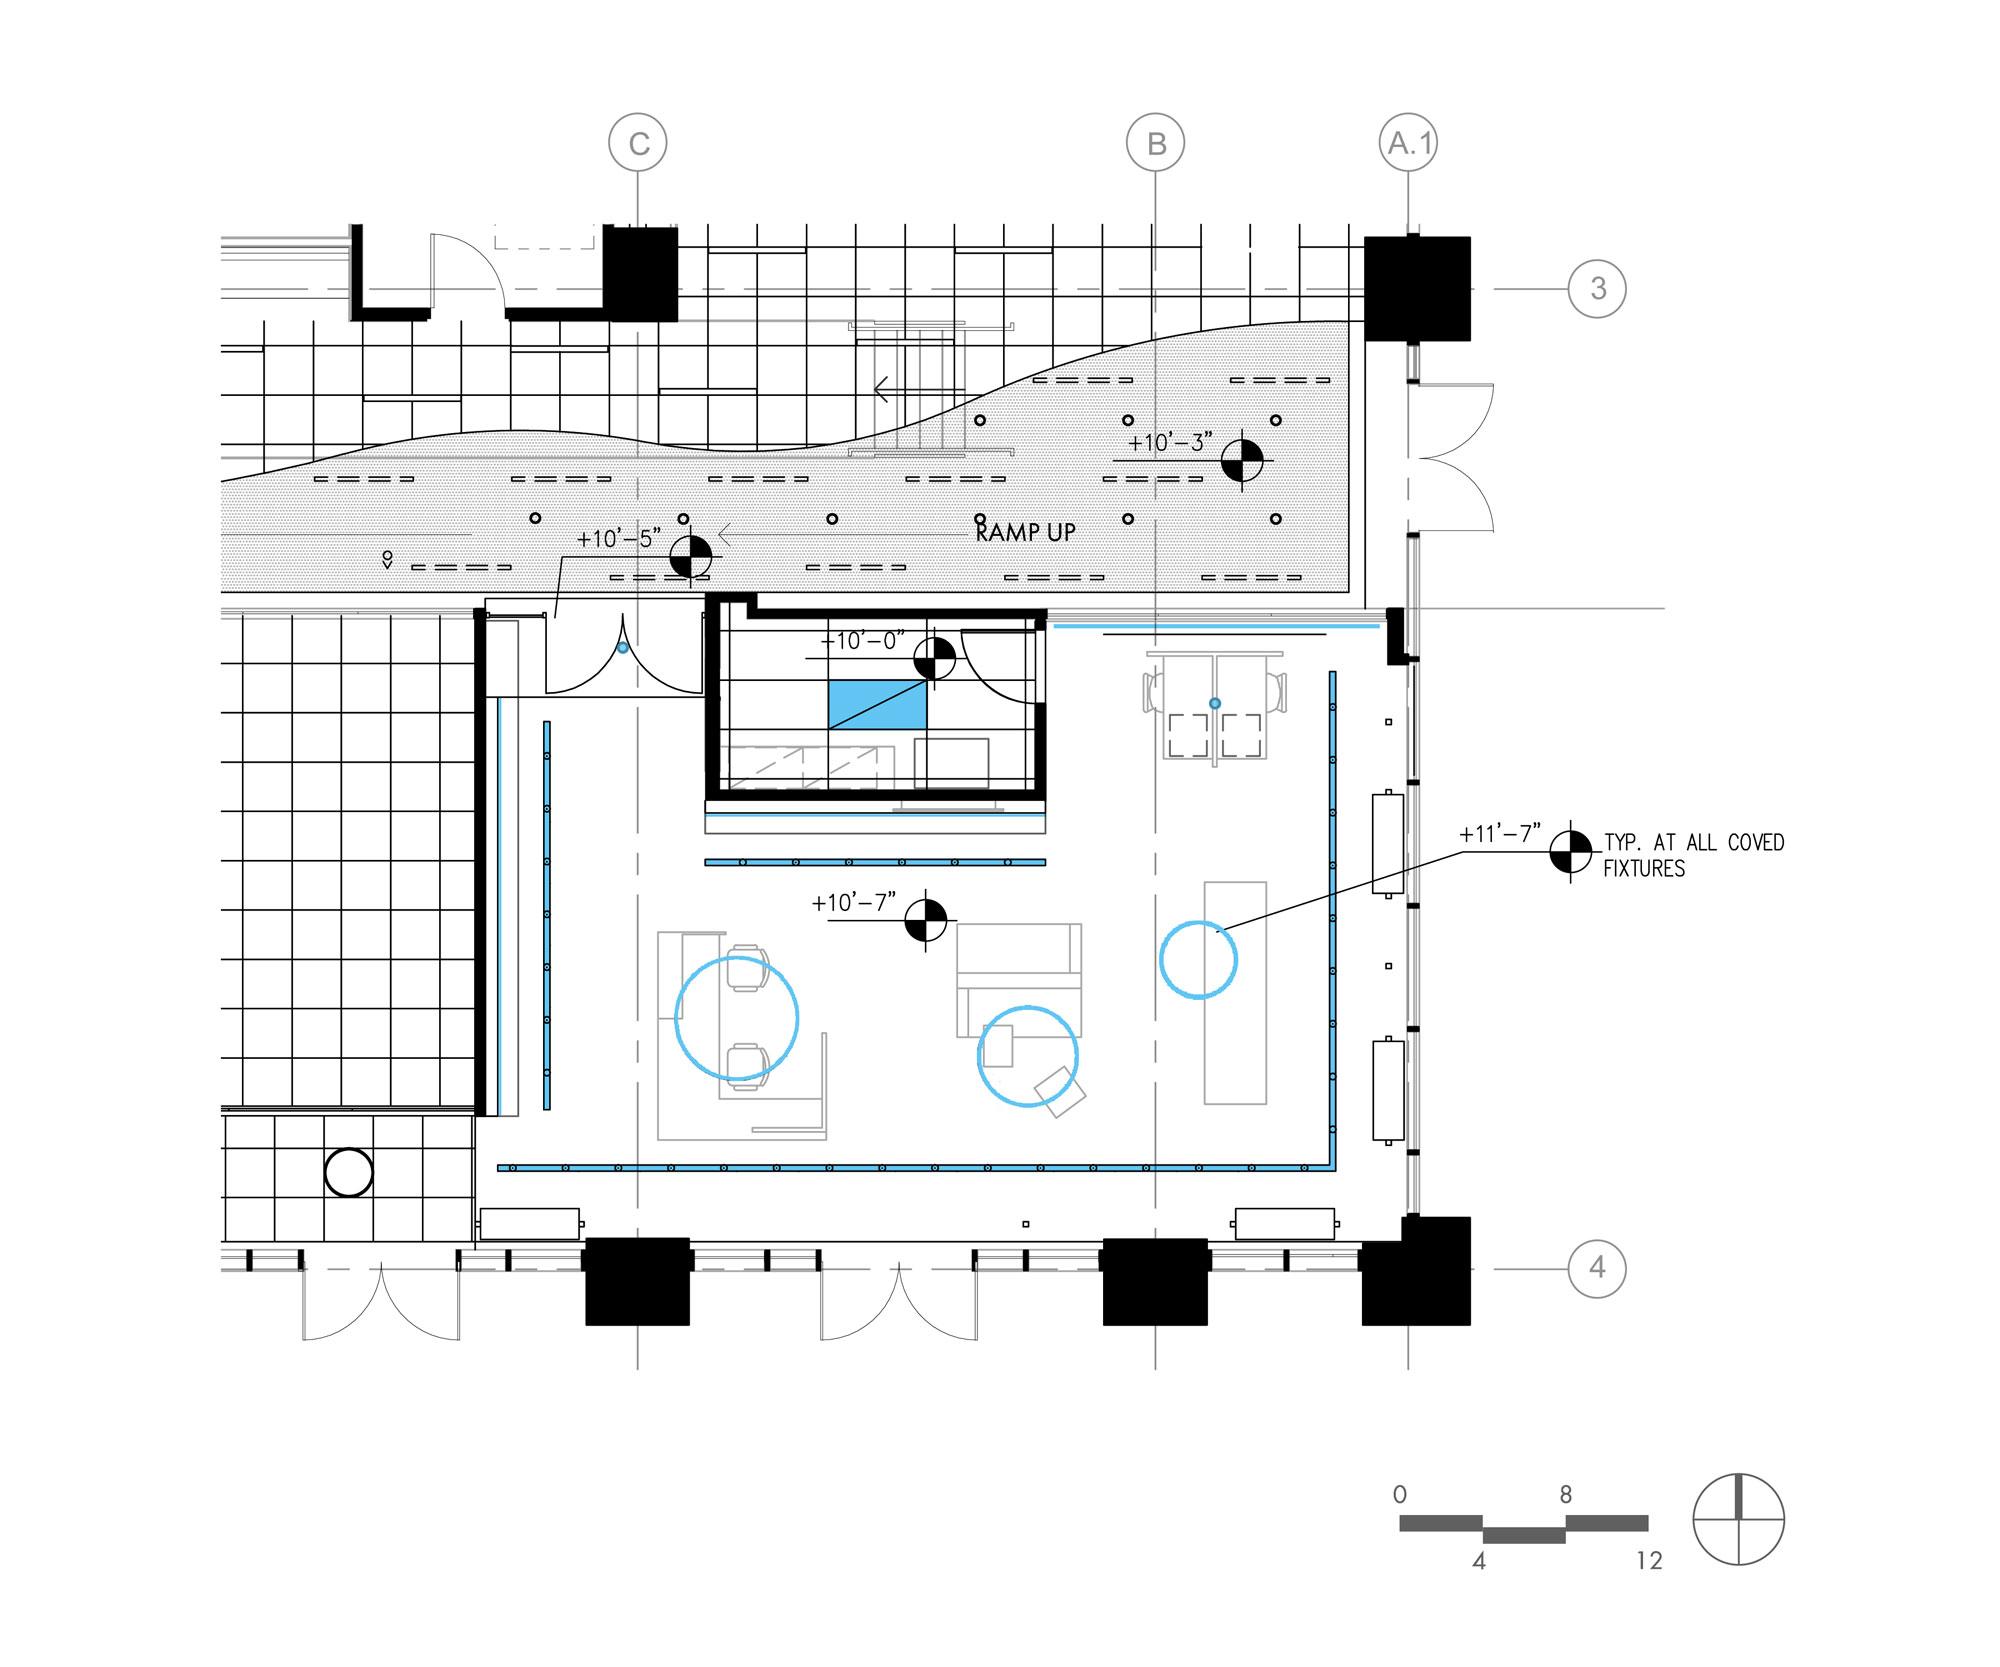 tsao-kp-tech-healthy-living-retail-plan-02.jpg